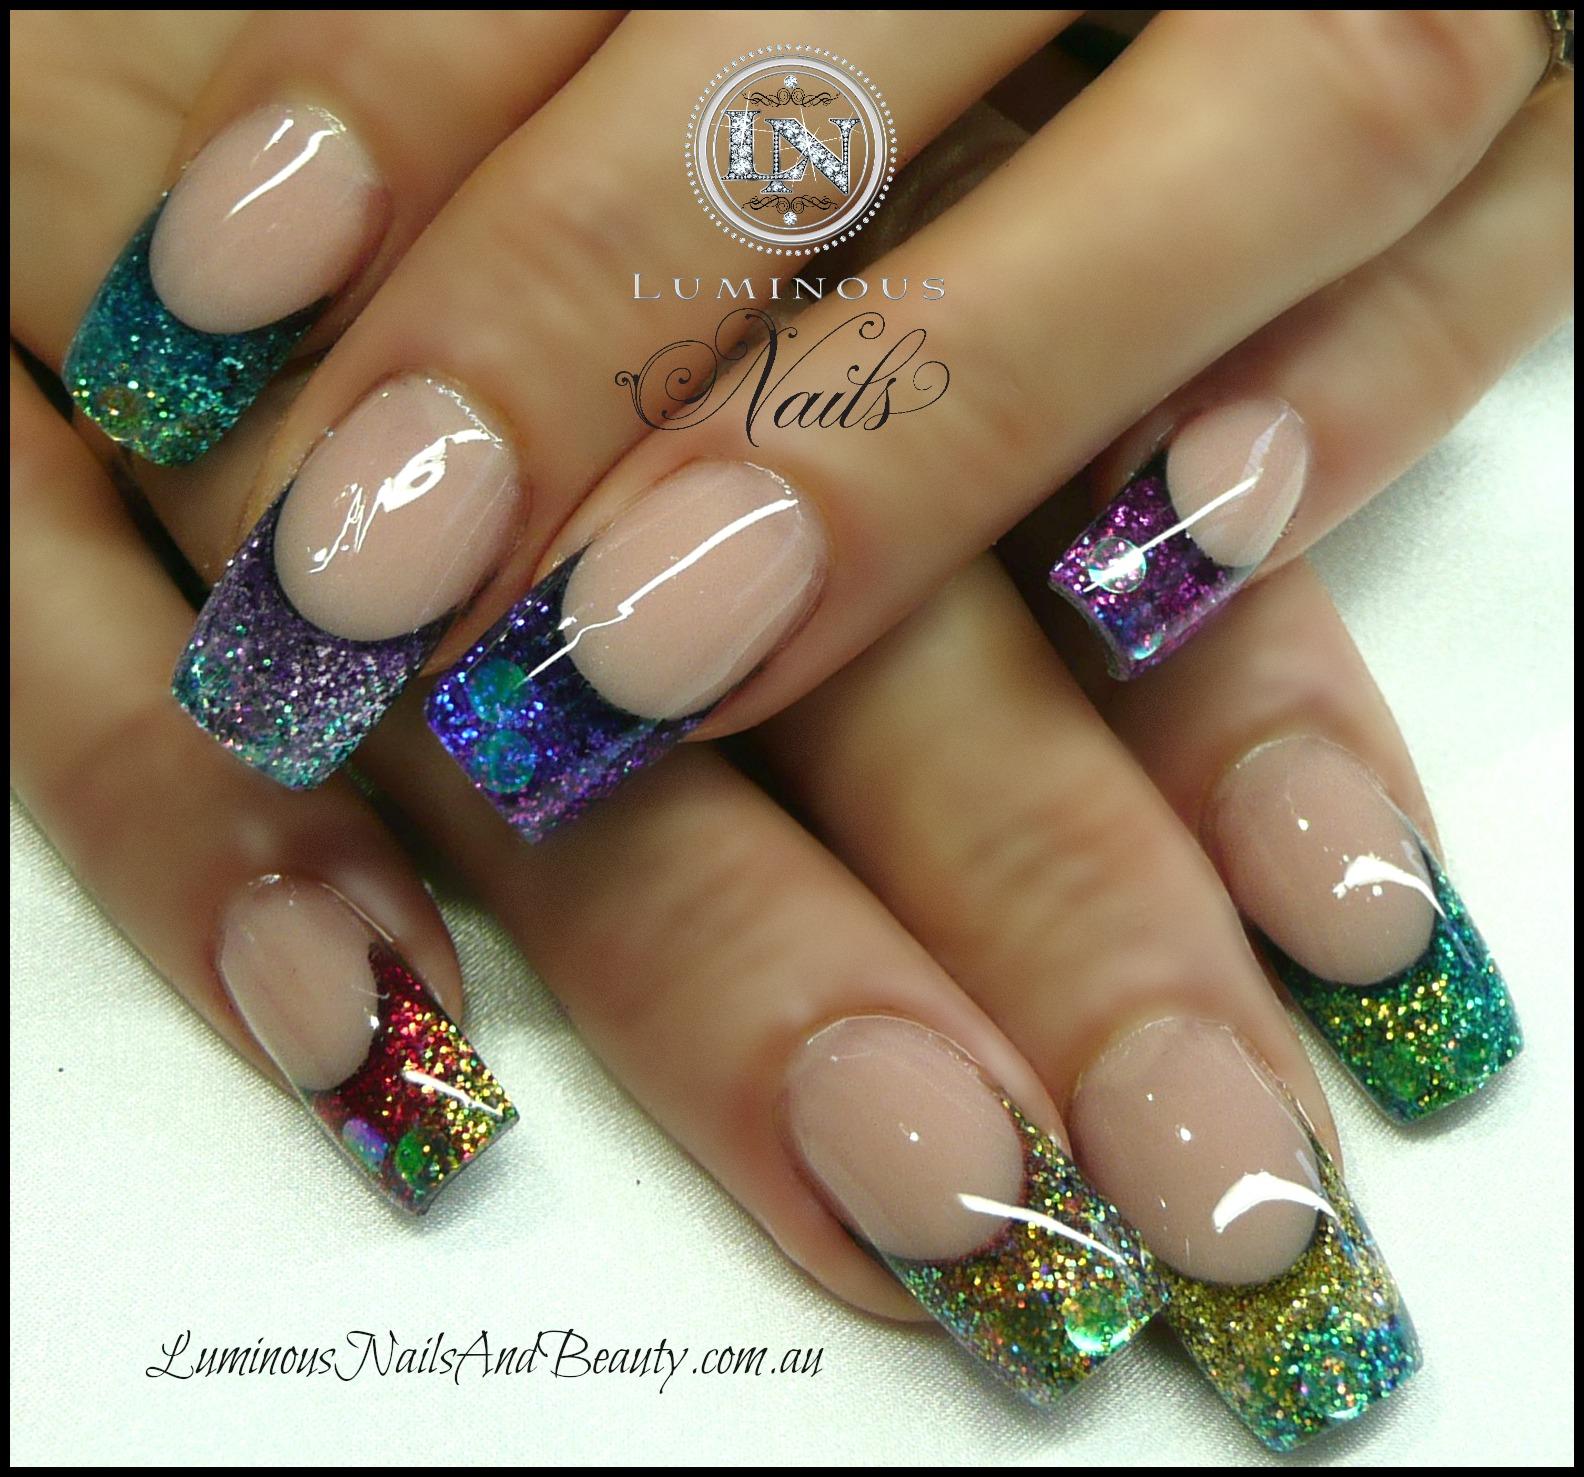 Nail Art Acrylic Gel: Acrylic uv gel nail art home decoration live ...